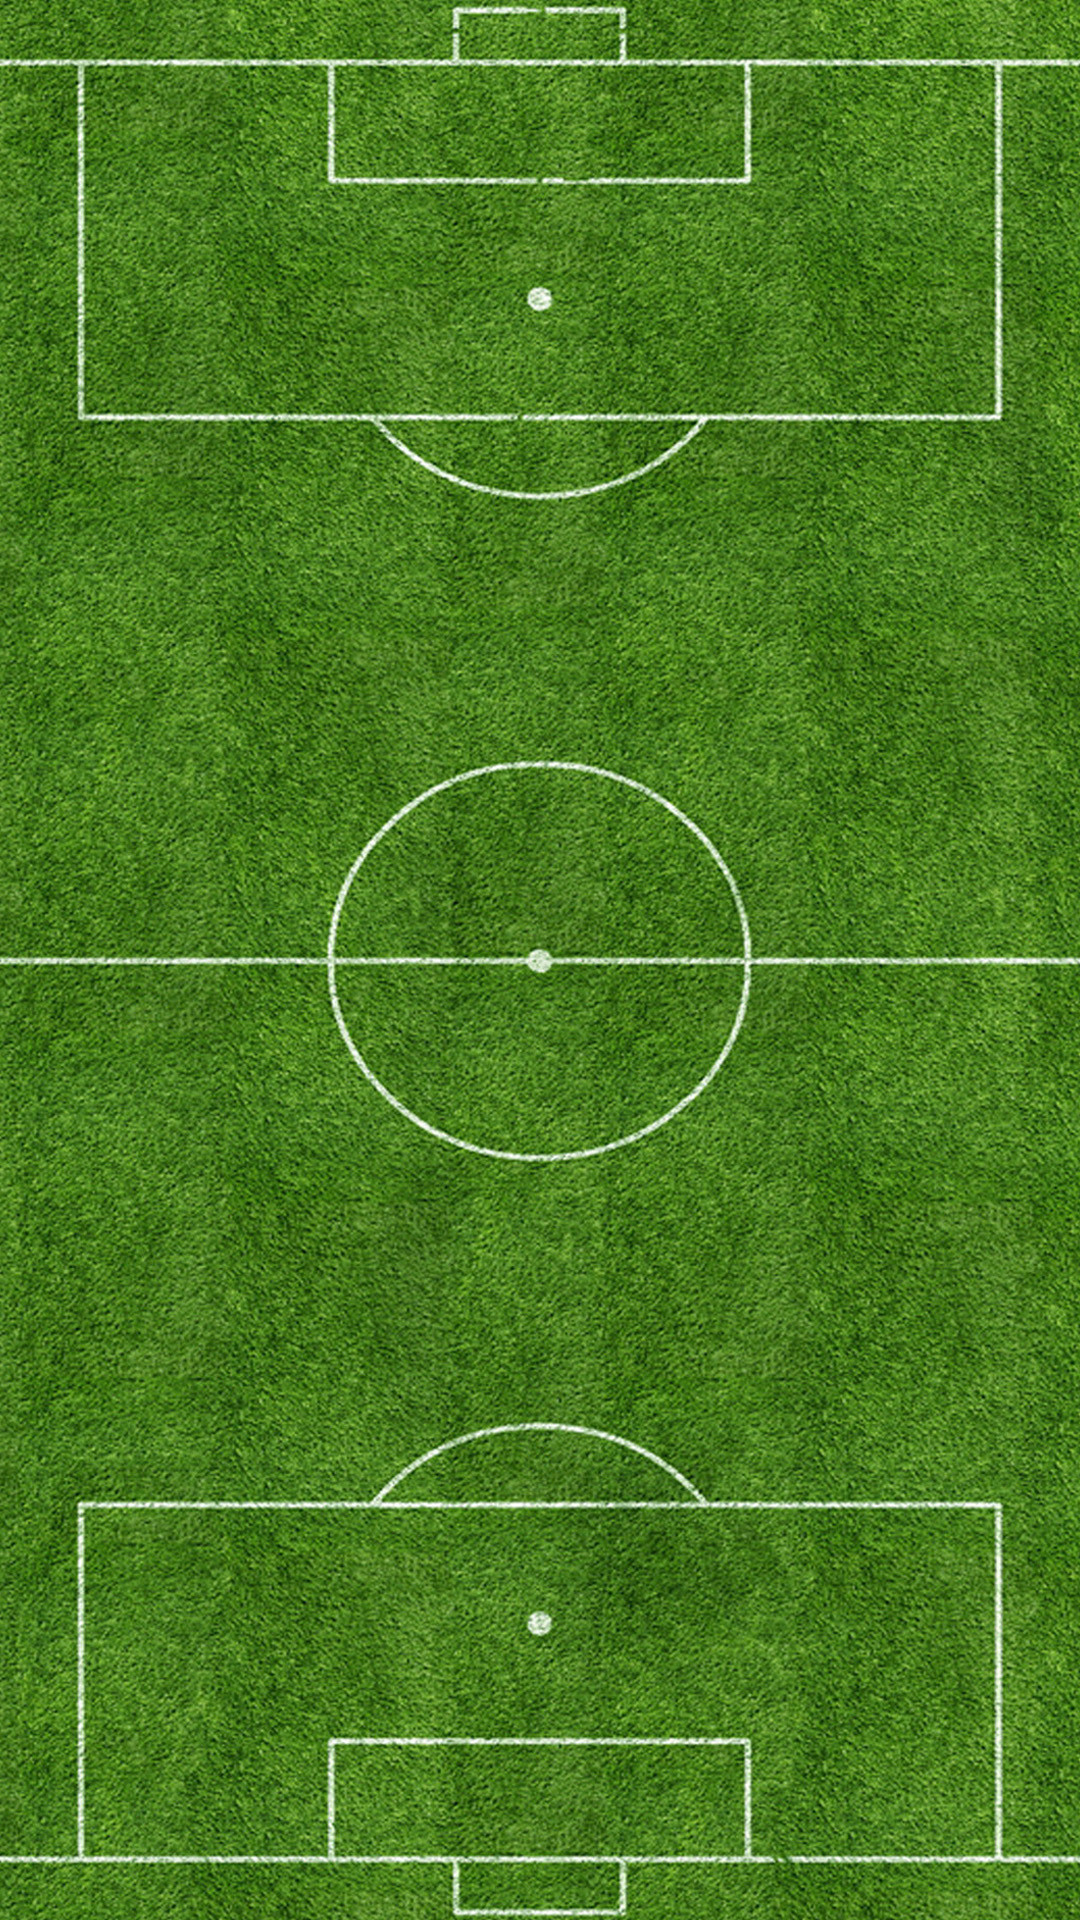 Football Field Htc One M8 wallpaper | Htc One M8 Wallpaper